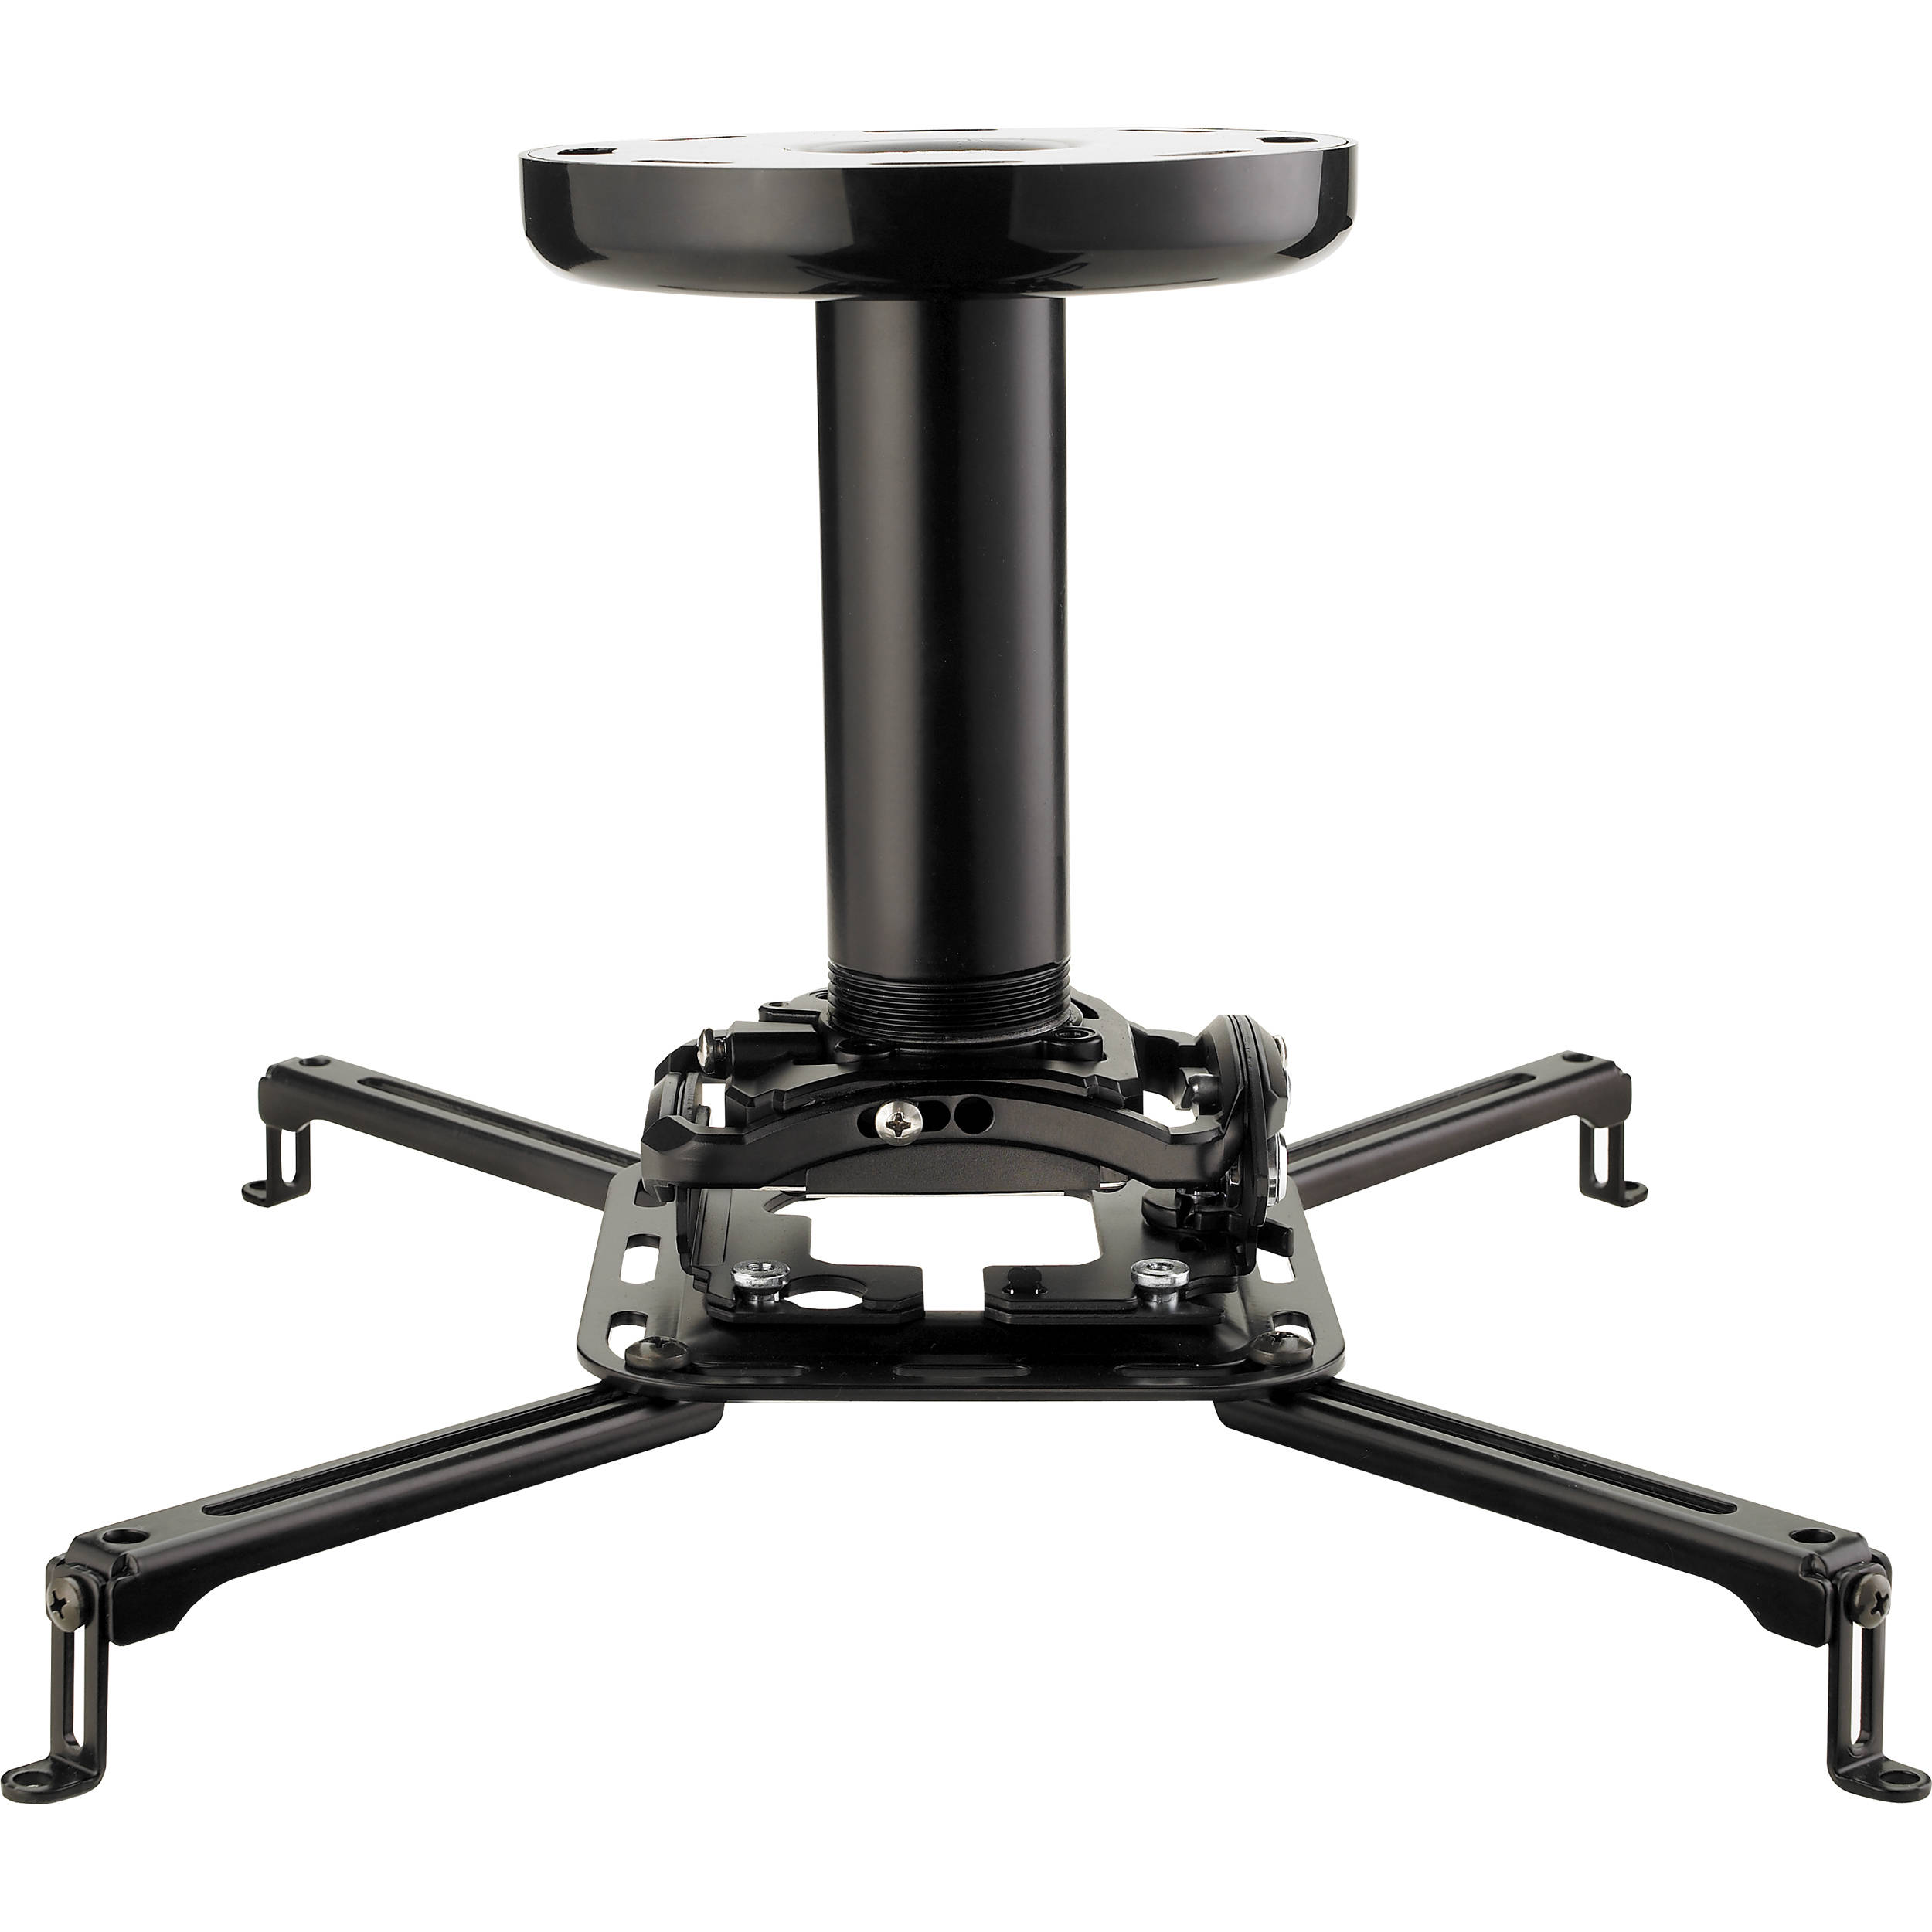 Sanus Visionmount Projector Mount Projectors Up To 35 Lb